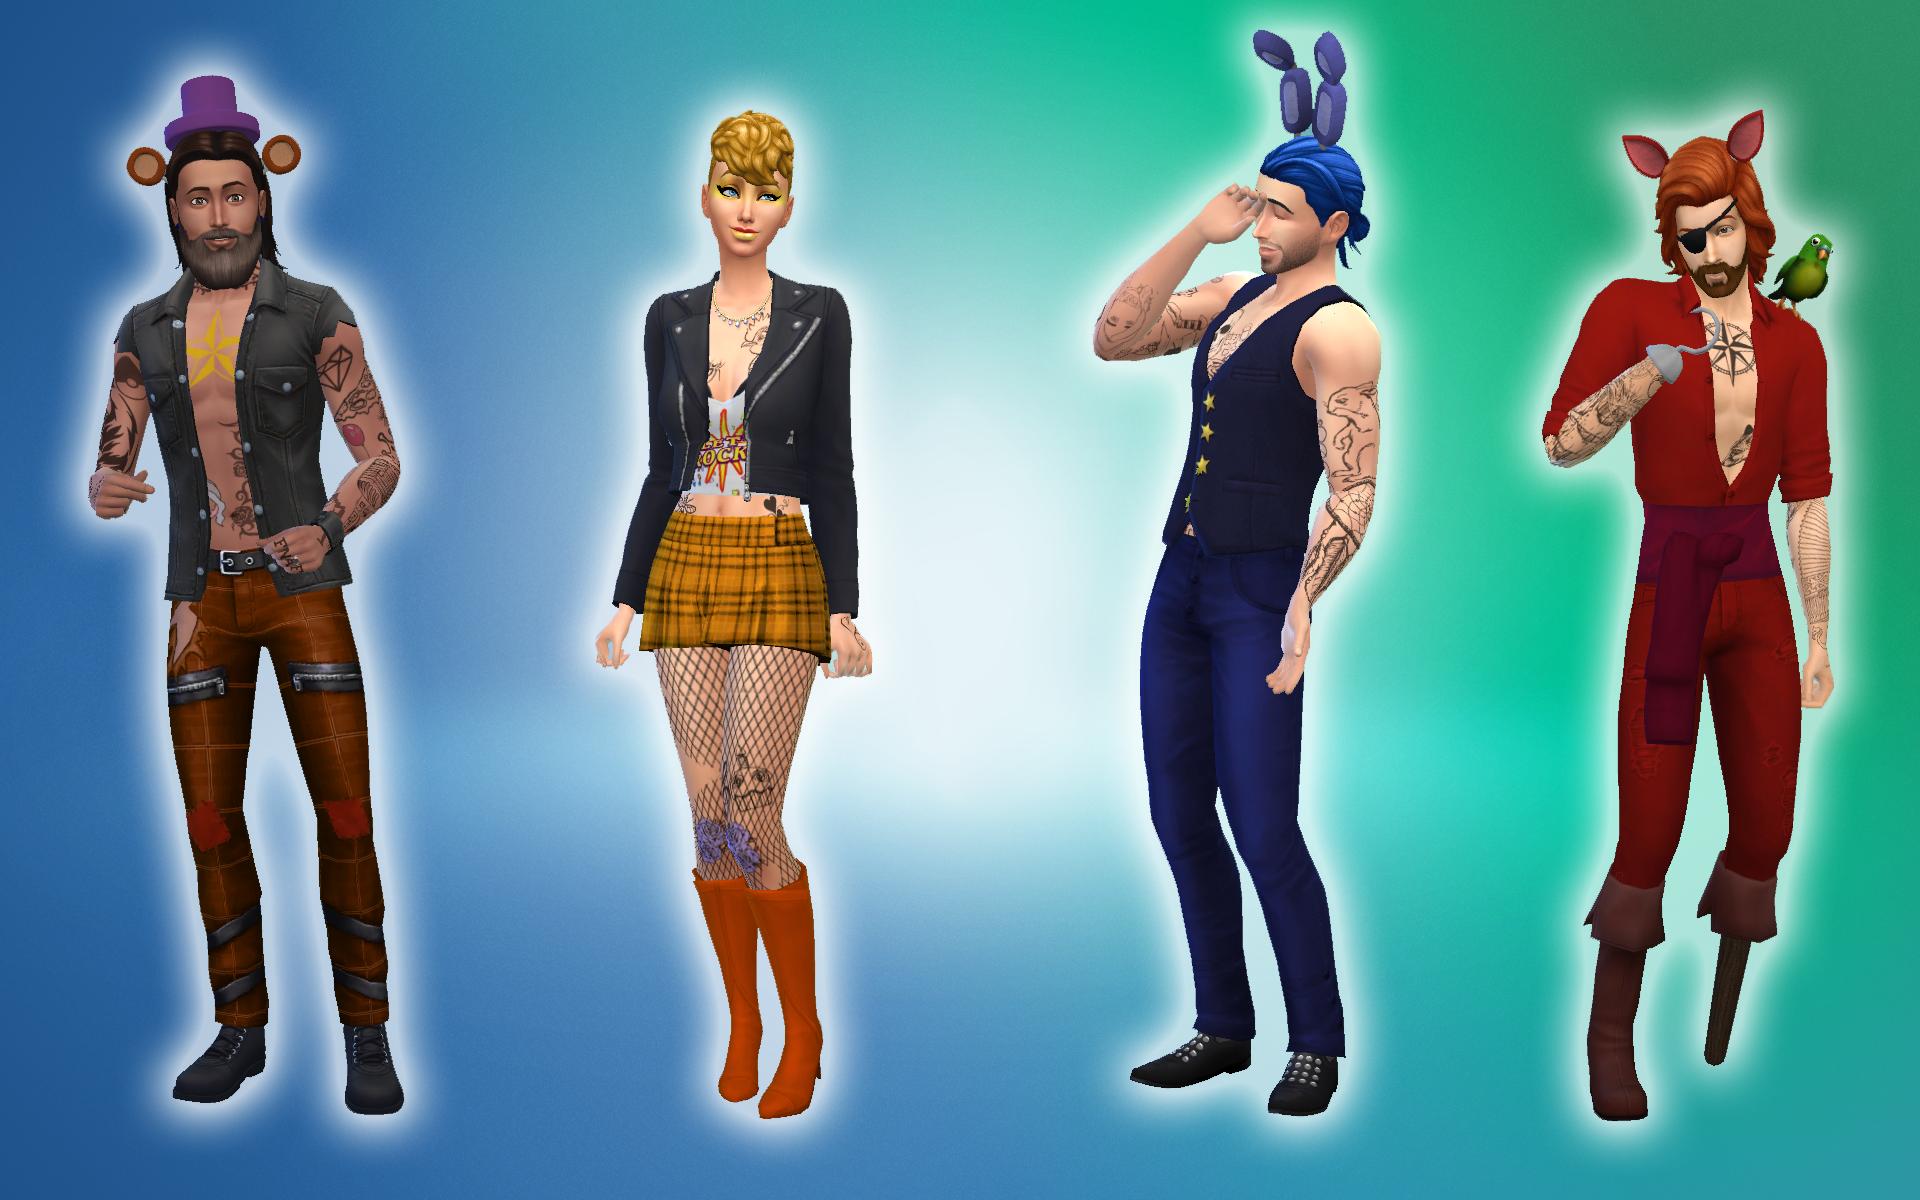 Pin on Sims 4 Fnaf